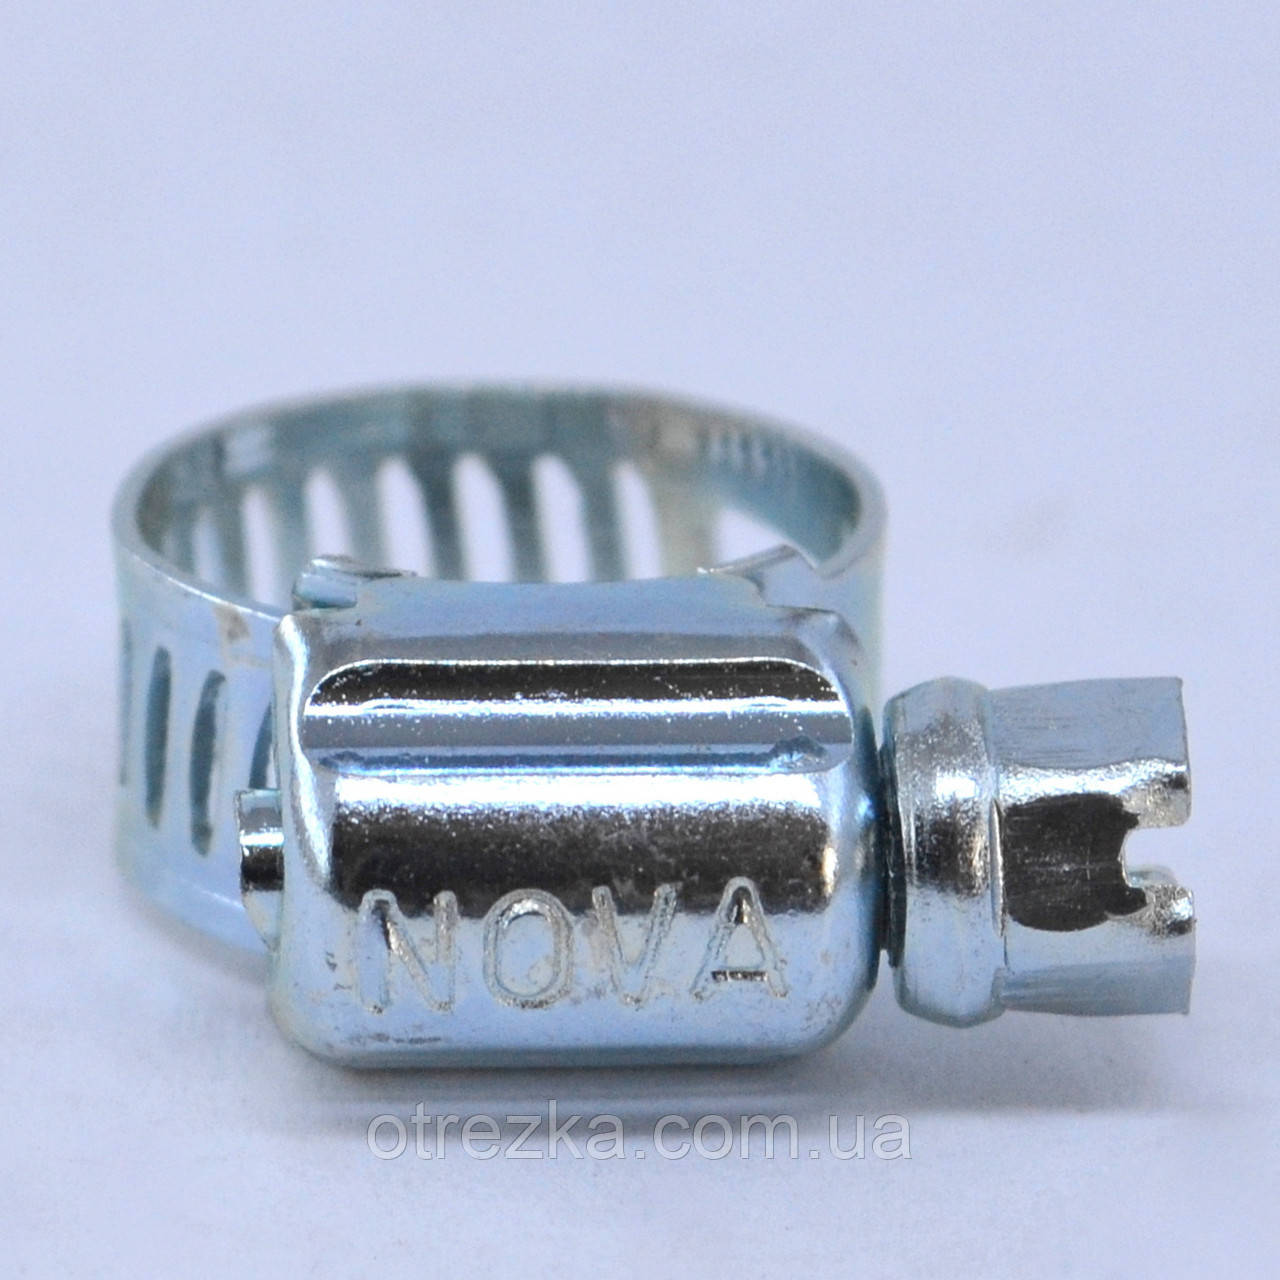 Хомут червячный  Nova (Хомут металевий черв'ячний) 20-30 мм